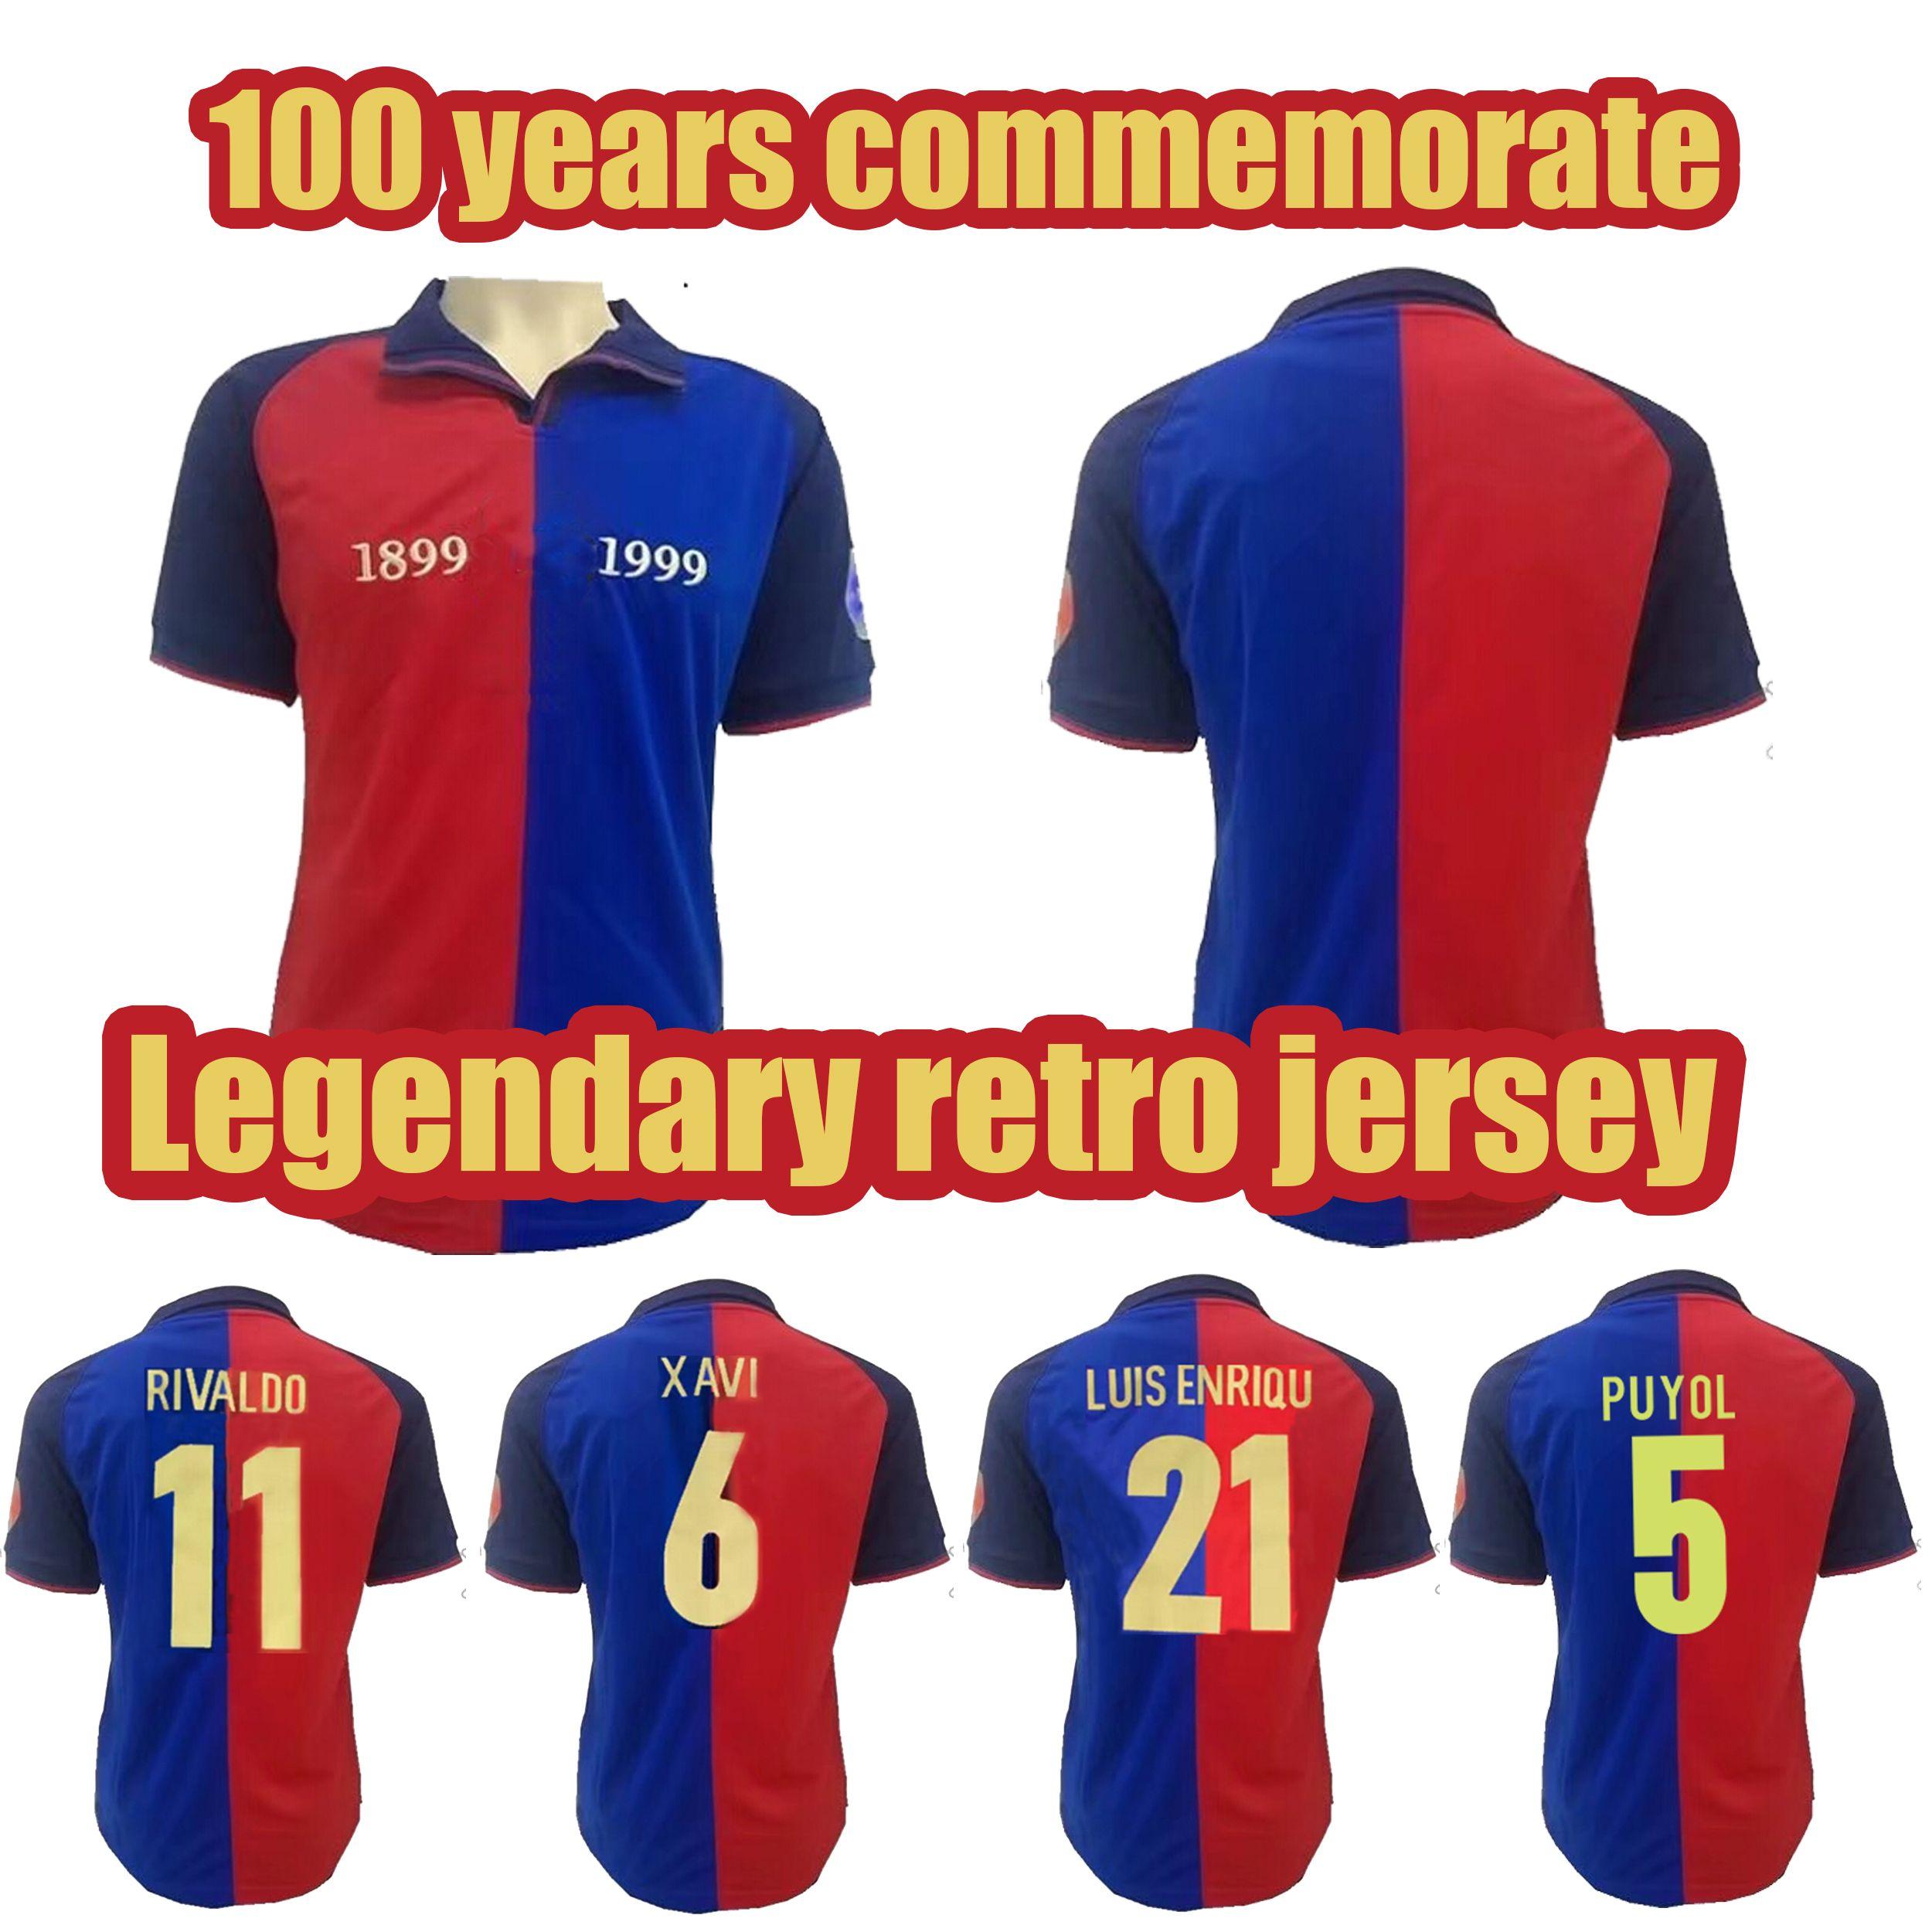 128c60e3e19 2019 Legendary Retro 1899 1999 Soccer Jerseys Retro 1899 1999 Guardiola  PUYOL Rivaldo XAVI Football Shirts Top Quality Soccer Jerseys From  Bao3667183